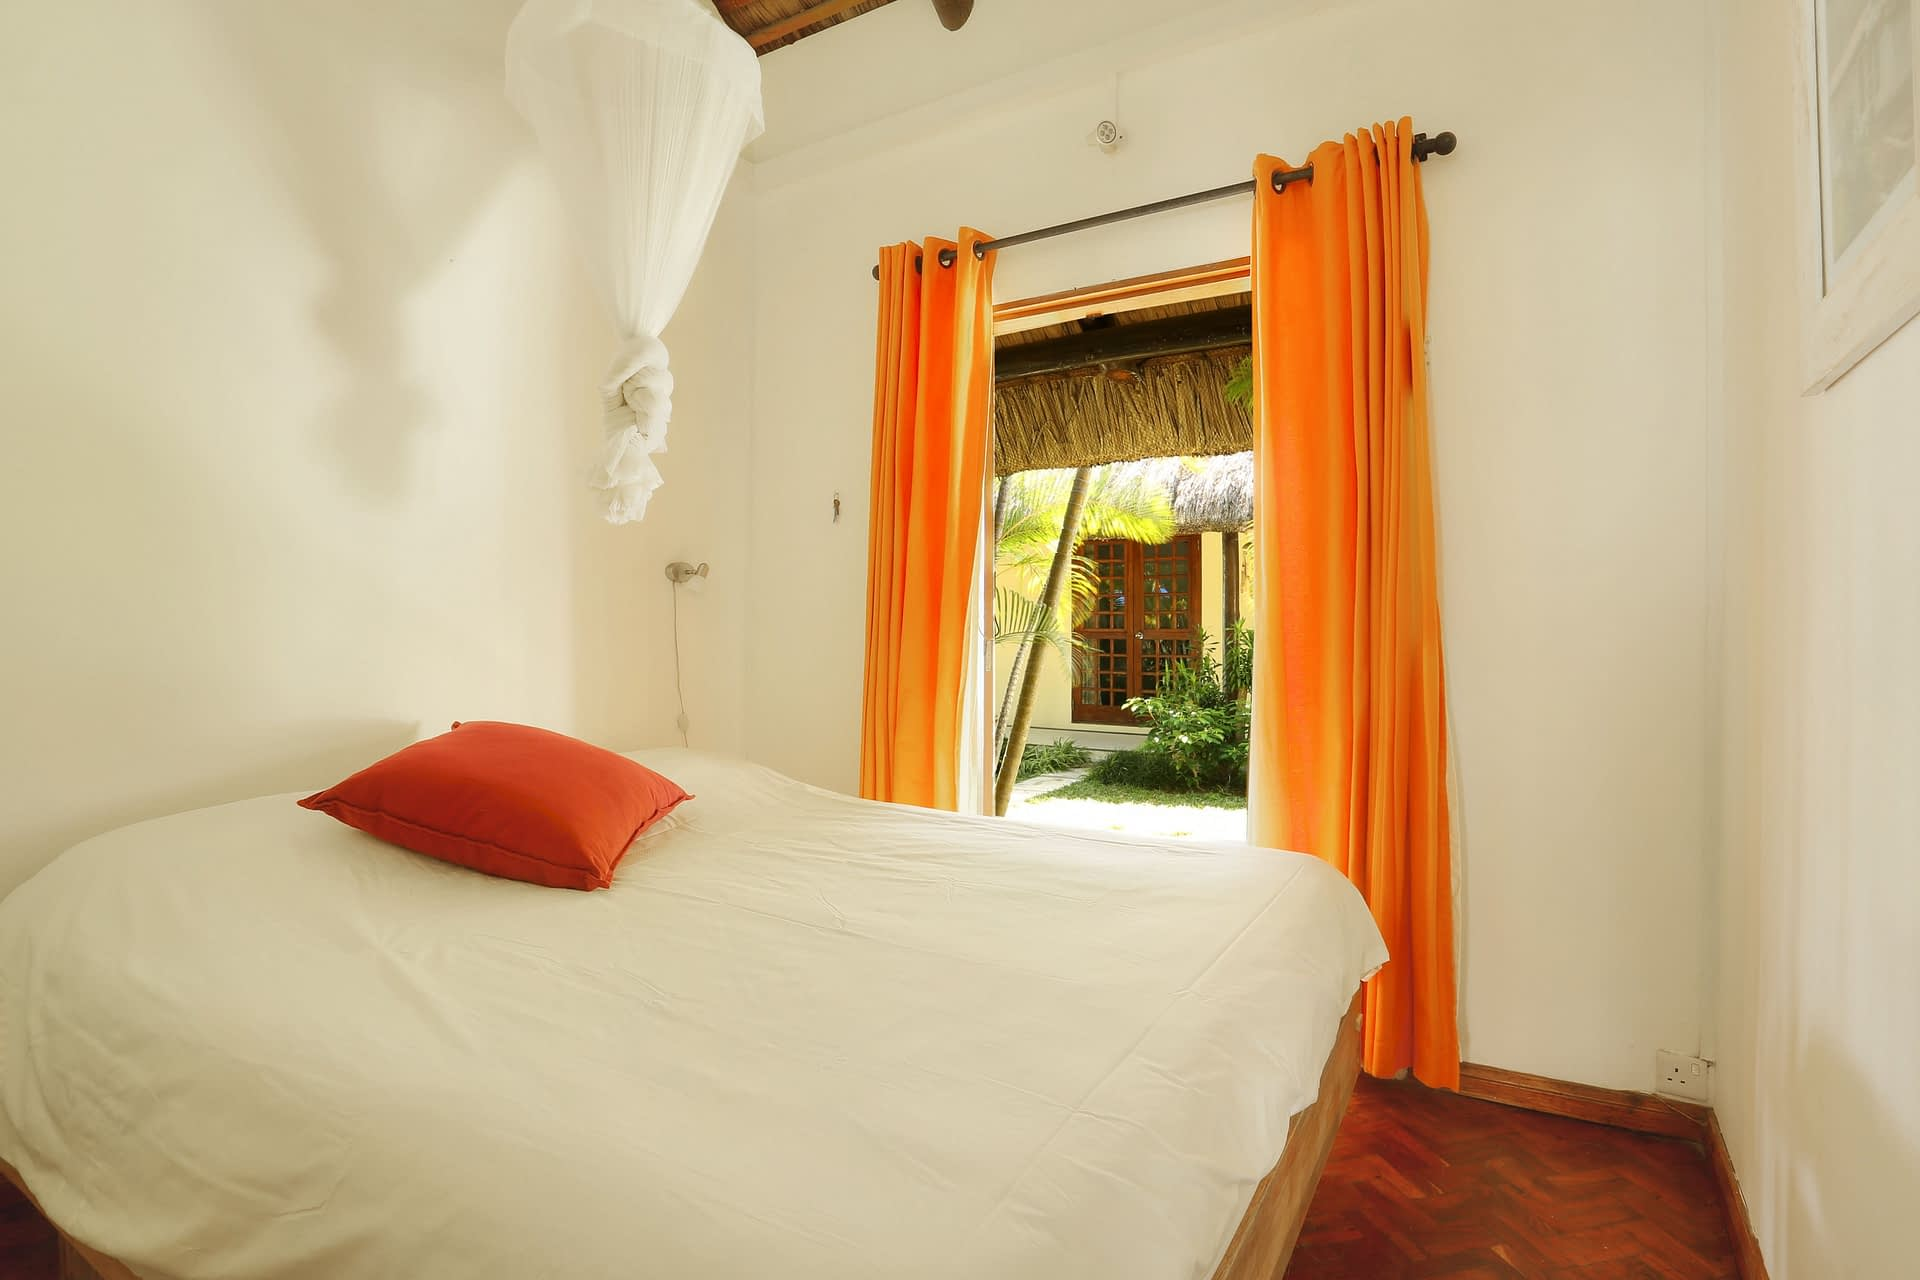 Samya-bedroom-4-b